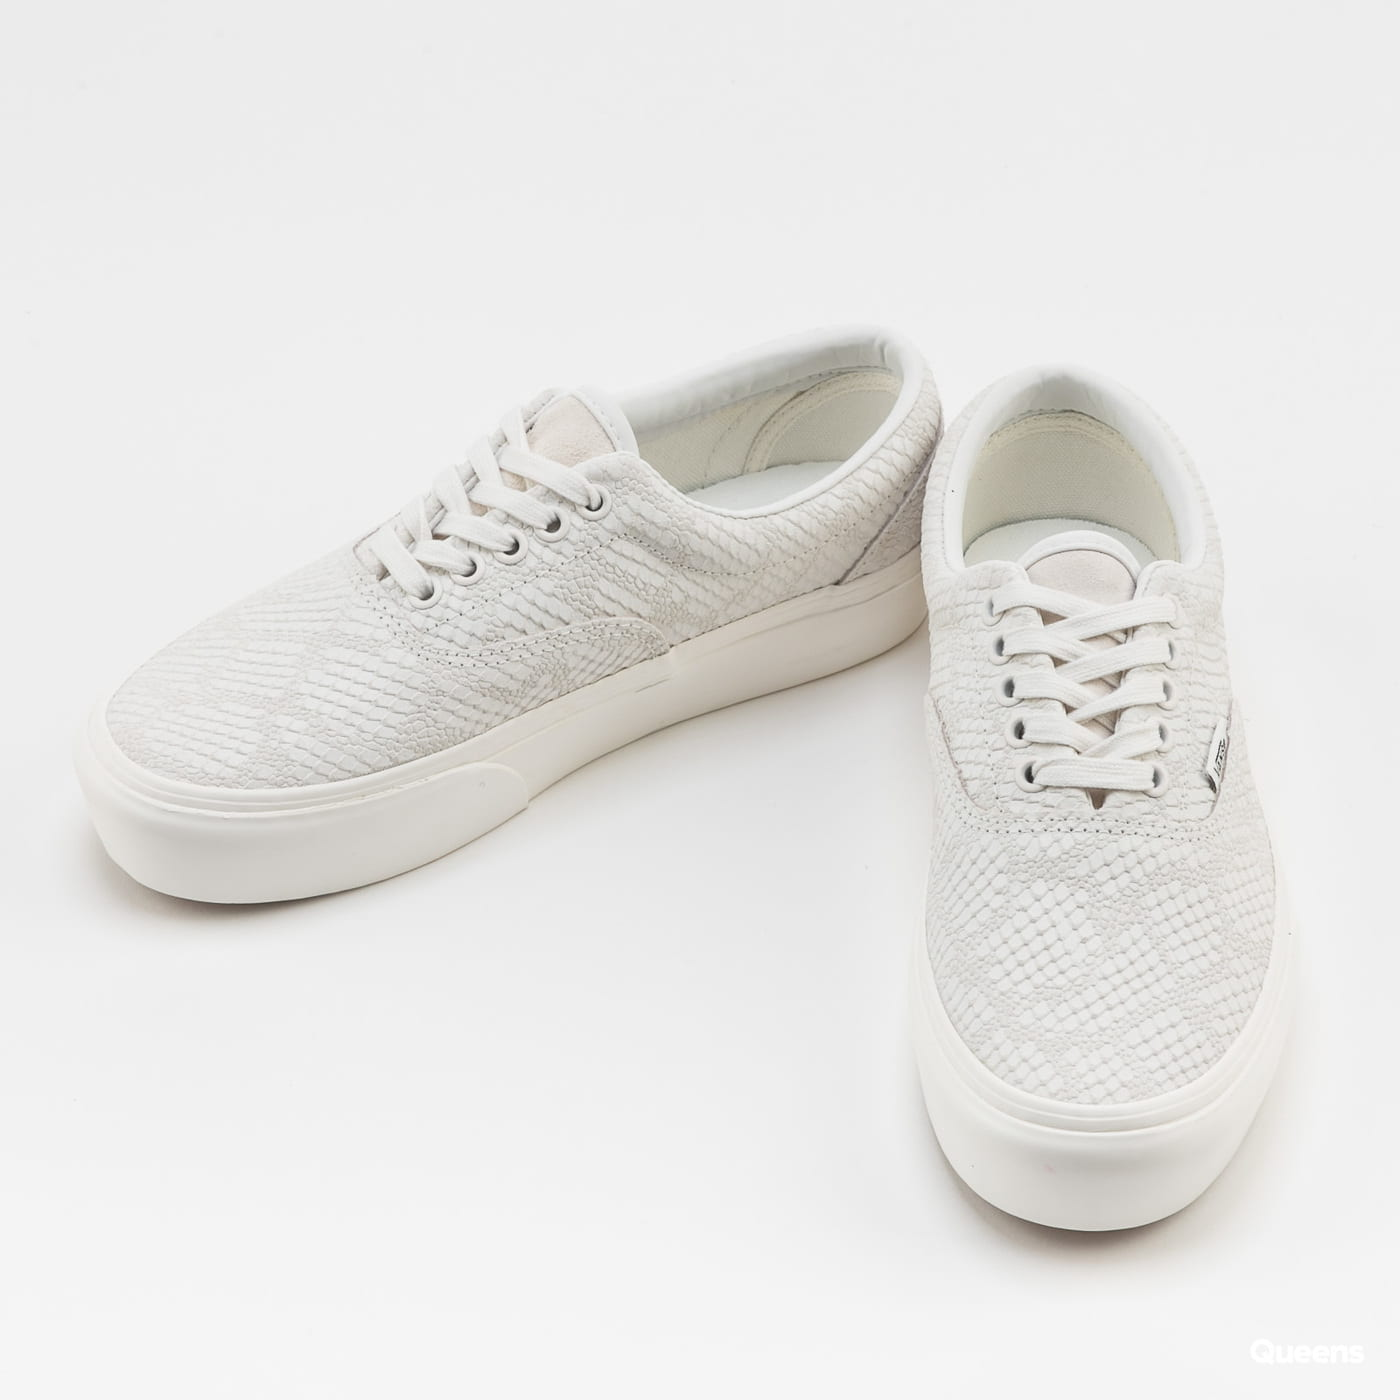 Vans Era Platform (animal) emboss / blanc de blanc